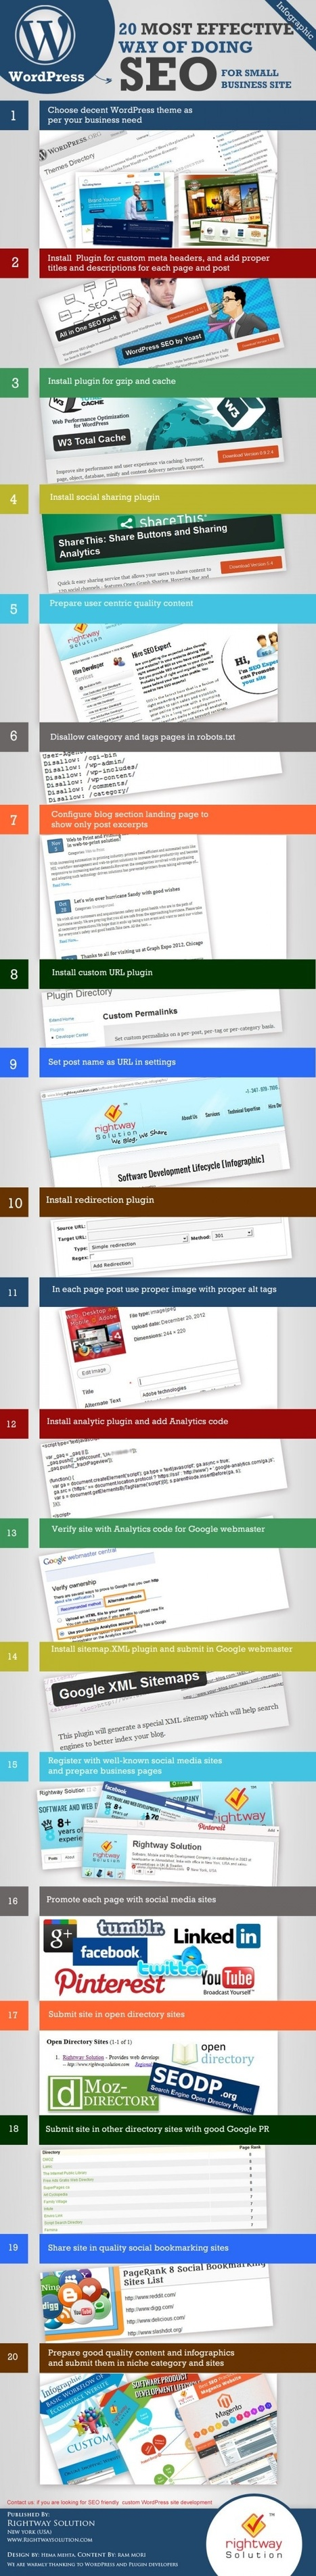 20 conseils SEO pour Wordpress | Digital & Mobile Marketing Toolkit | Scoop.it